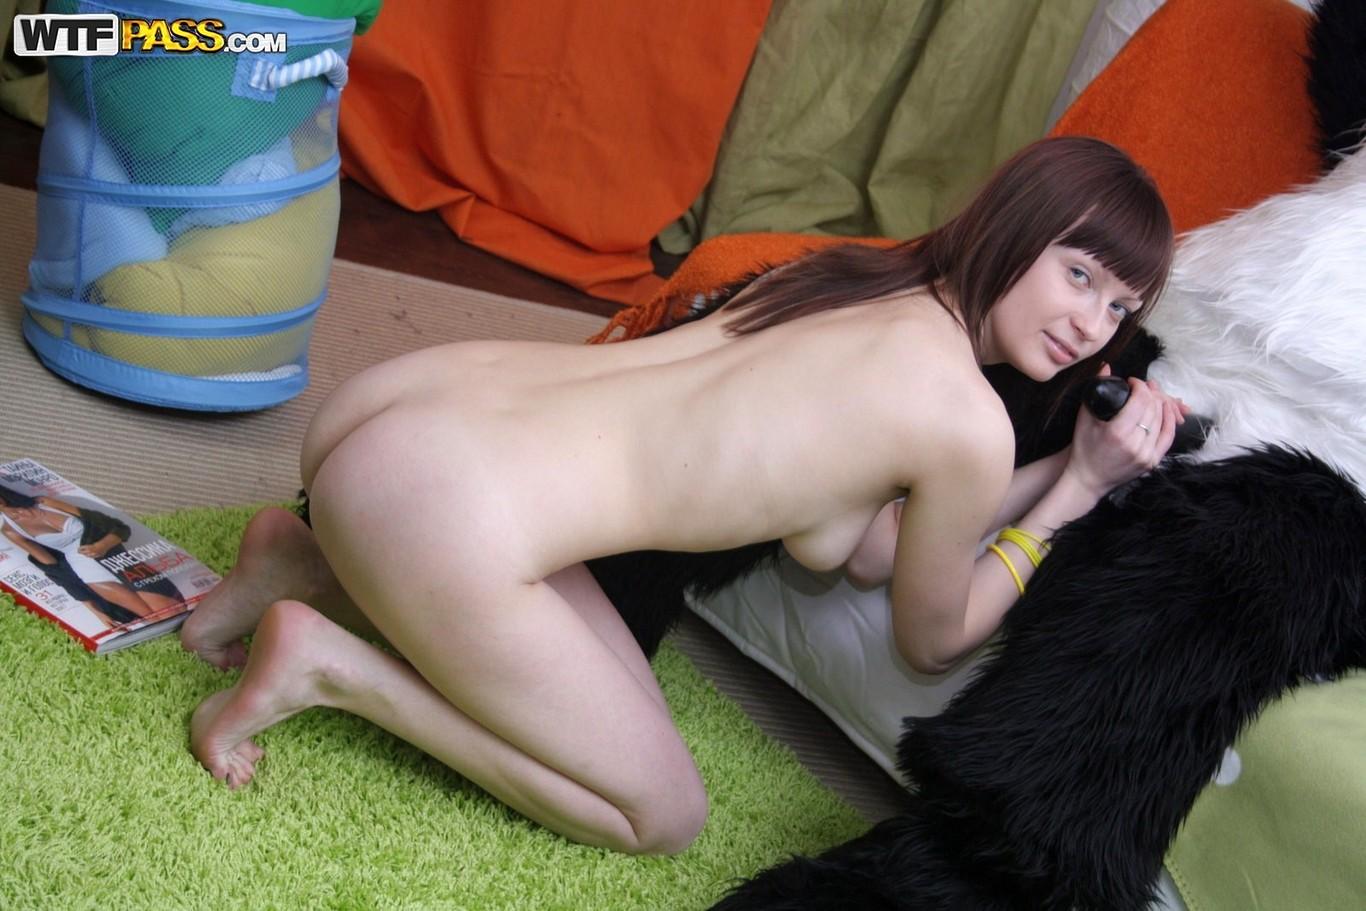 Panda fuck girl porn pic will not